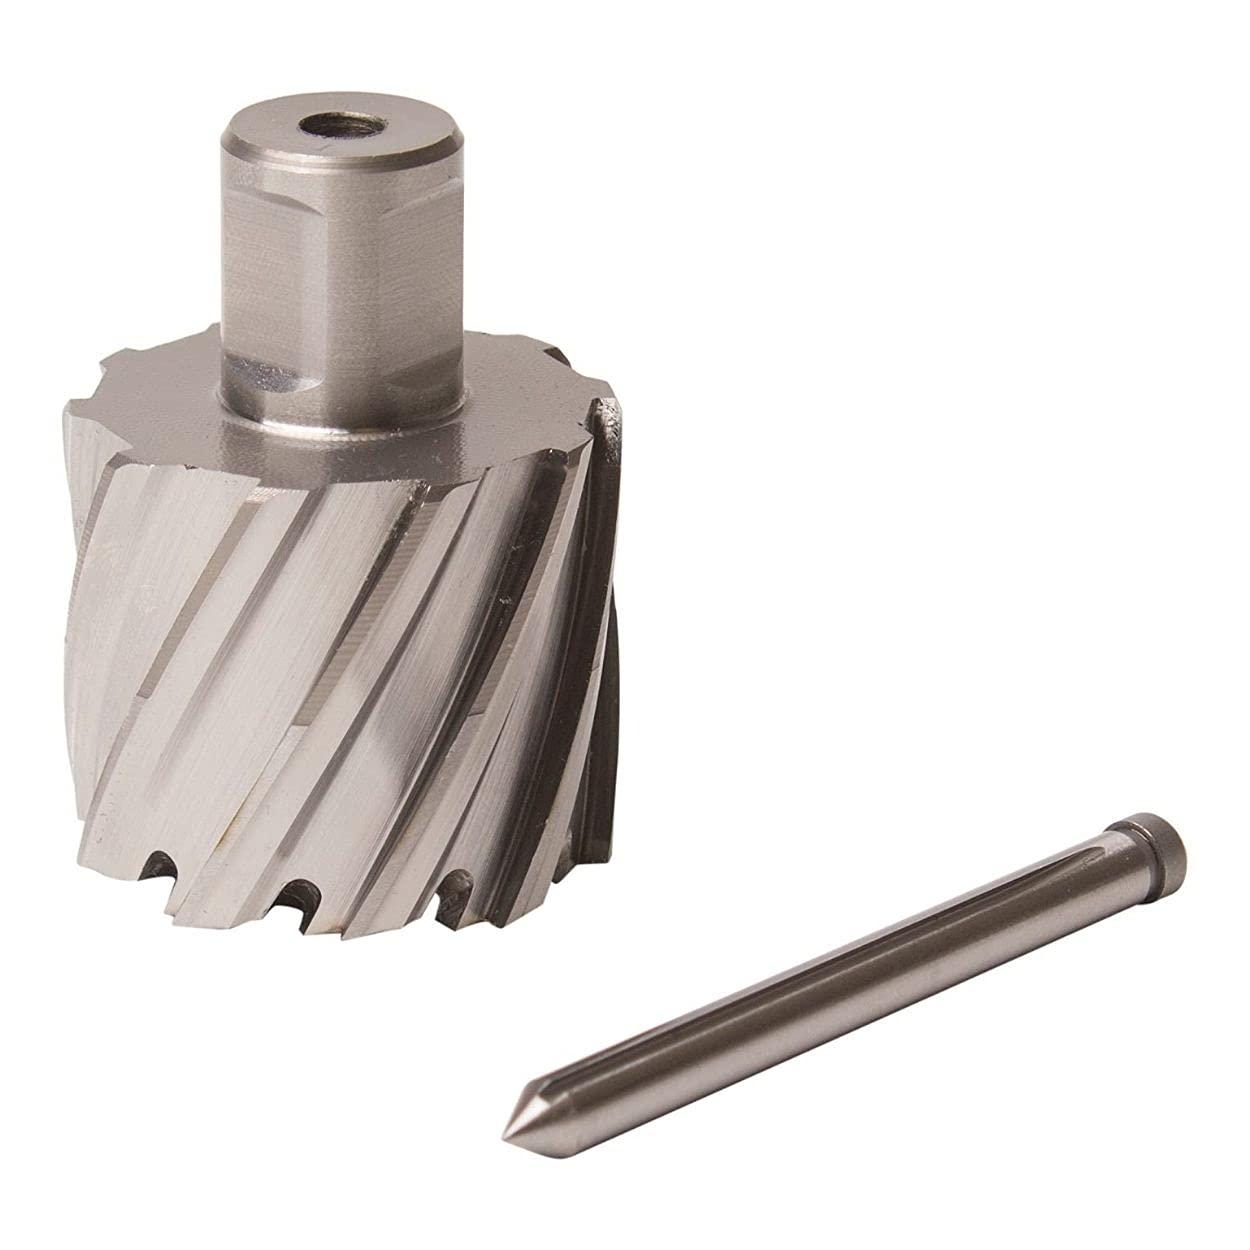 Jancy Slugger by Fein - HSS High order with Centering Annular Nova Popular product P Cutter